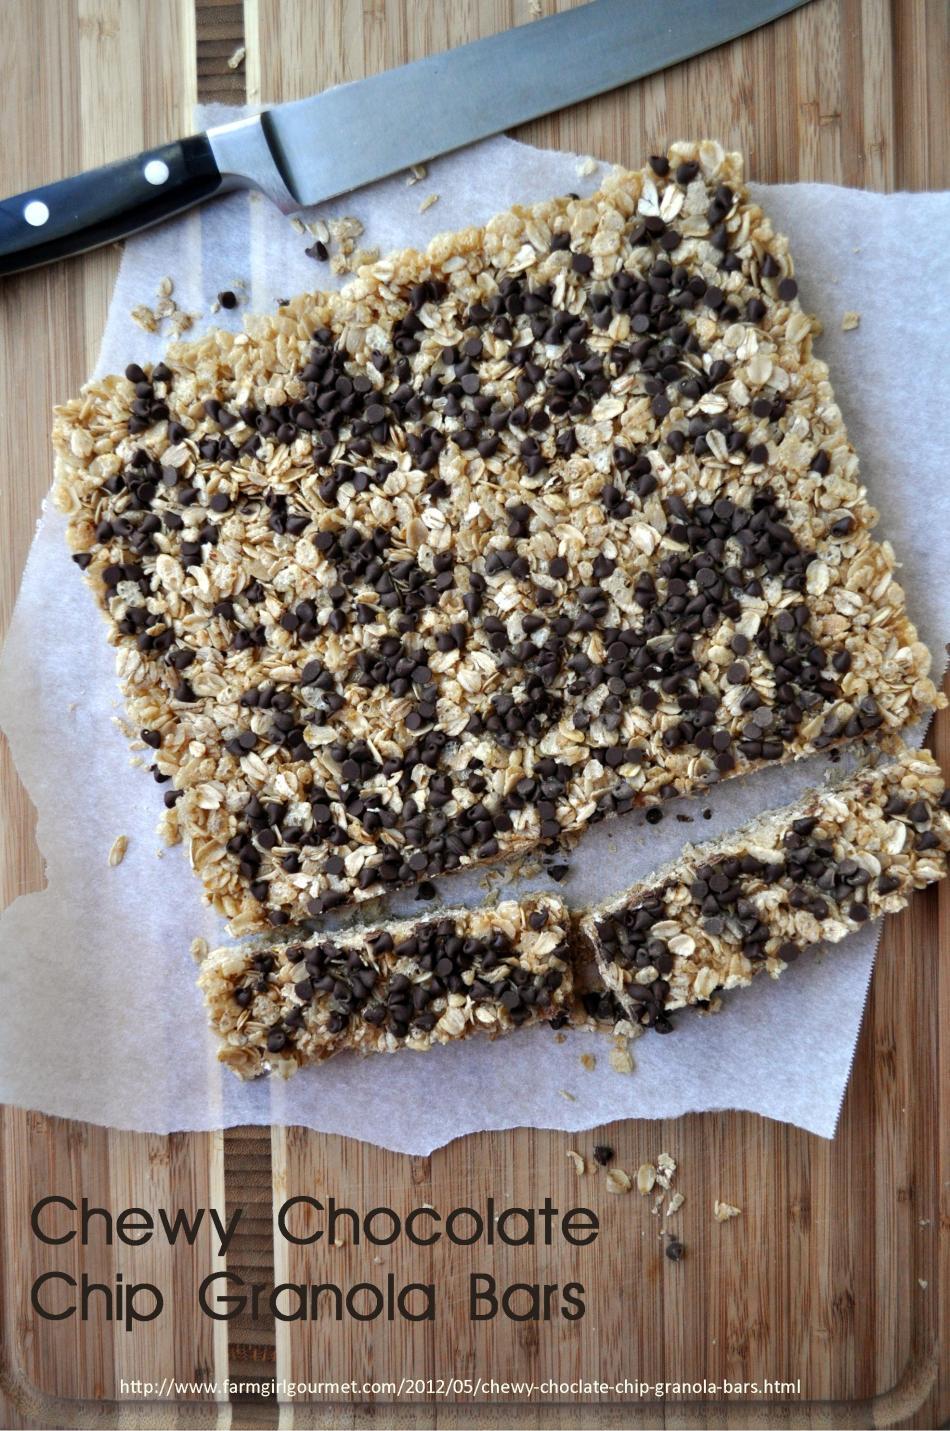 Chewy Chocolate Chip Granola Bars 2